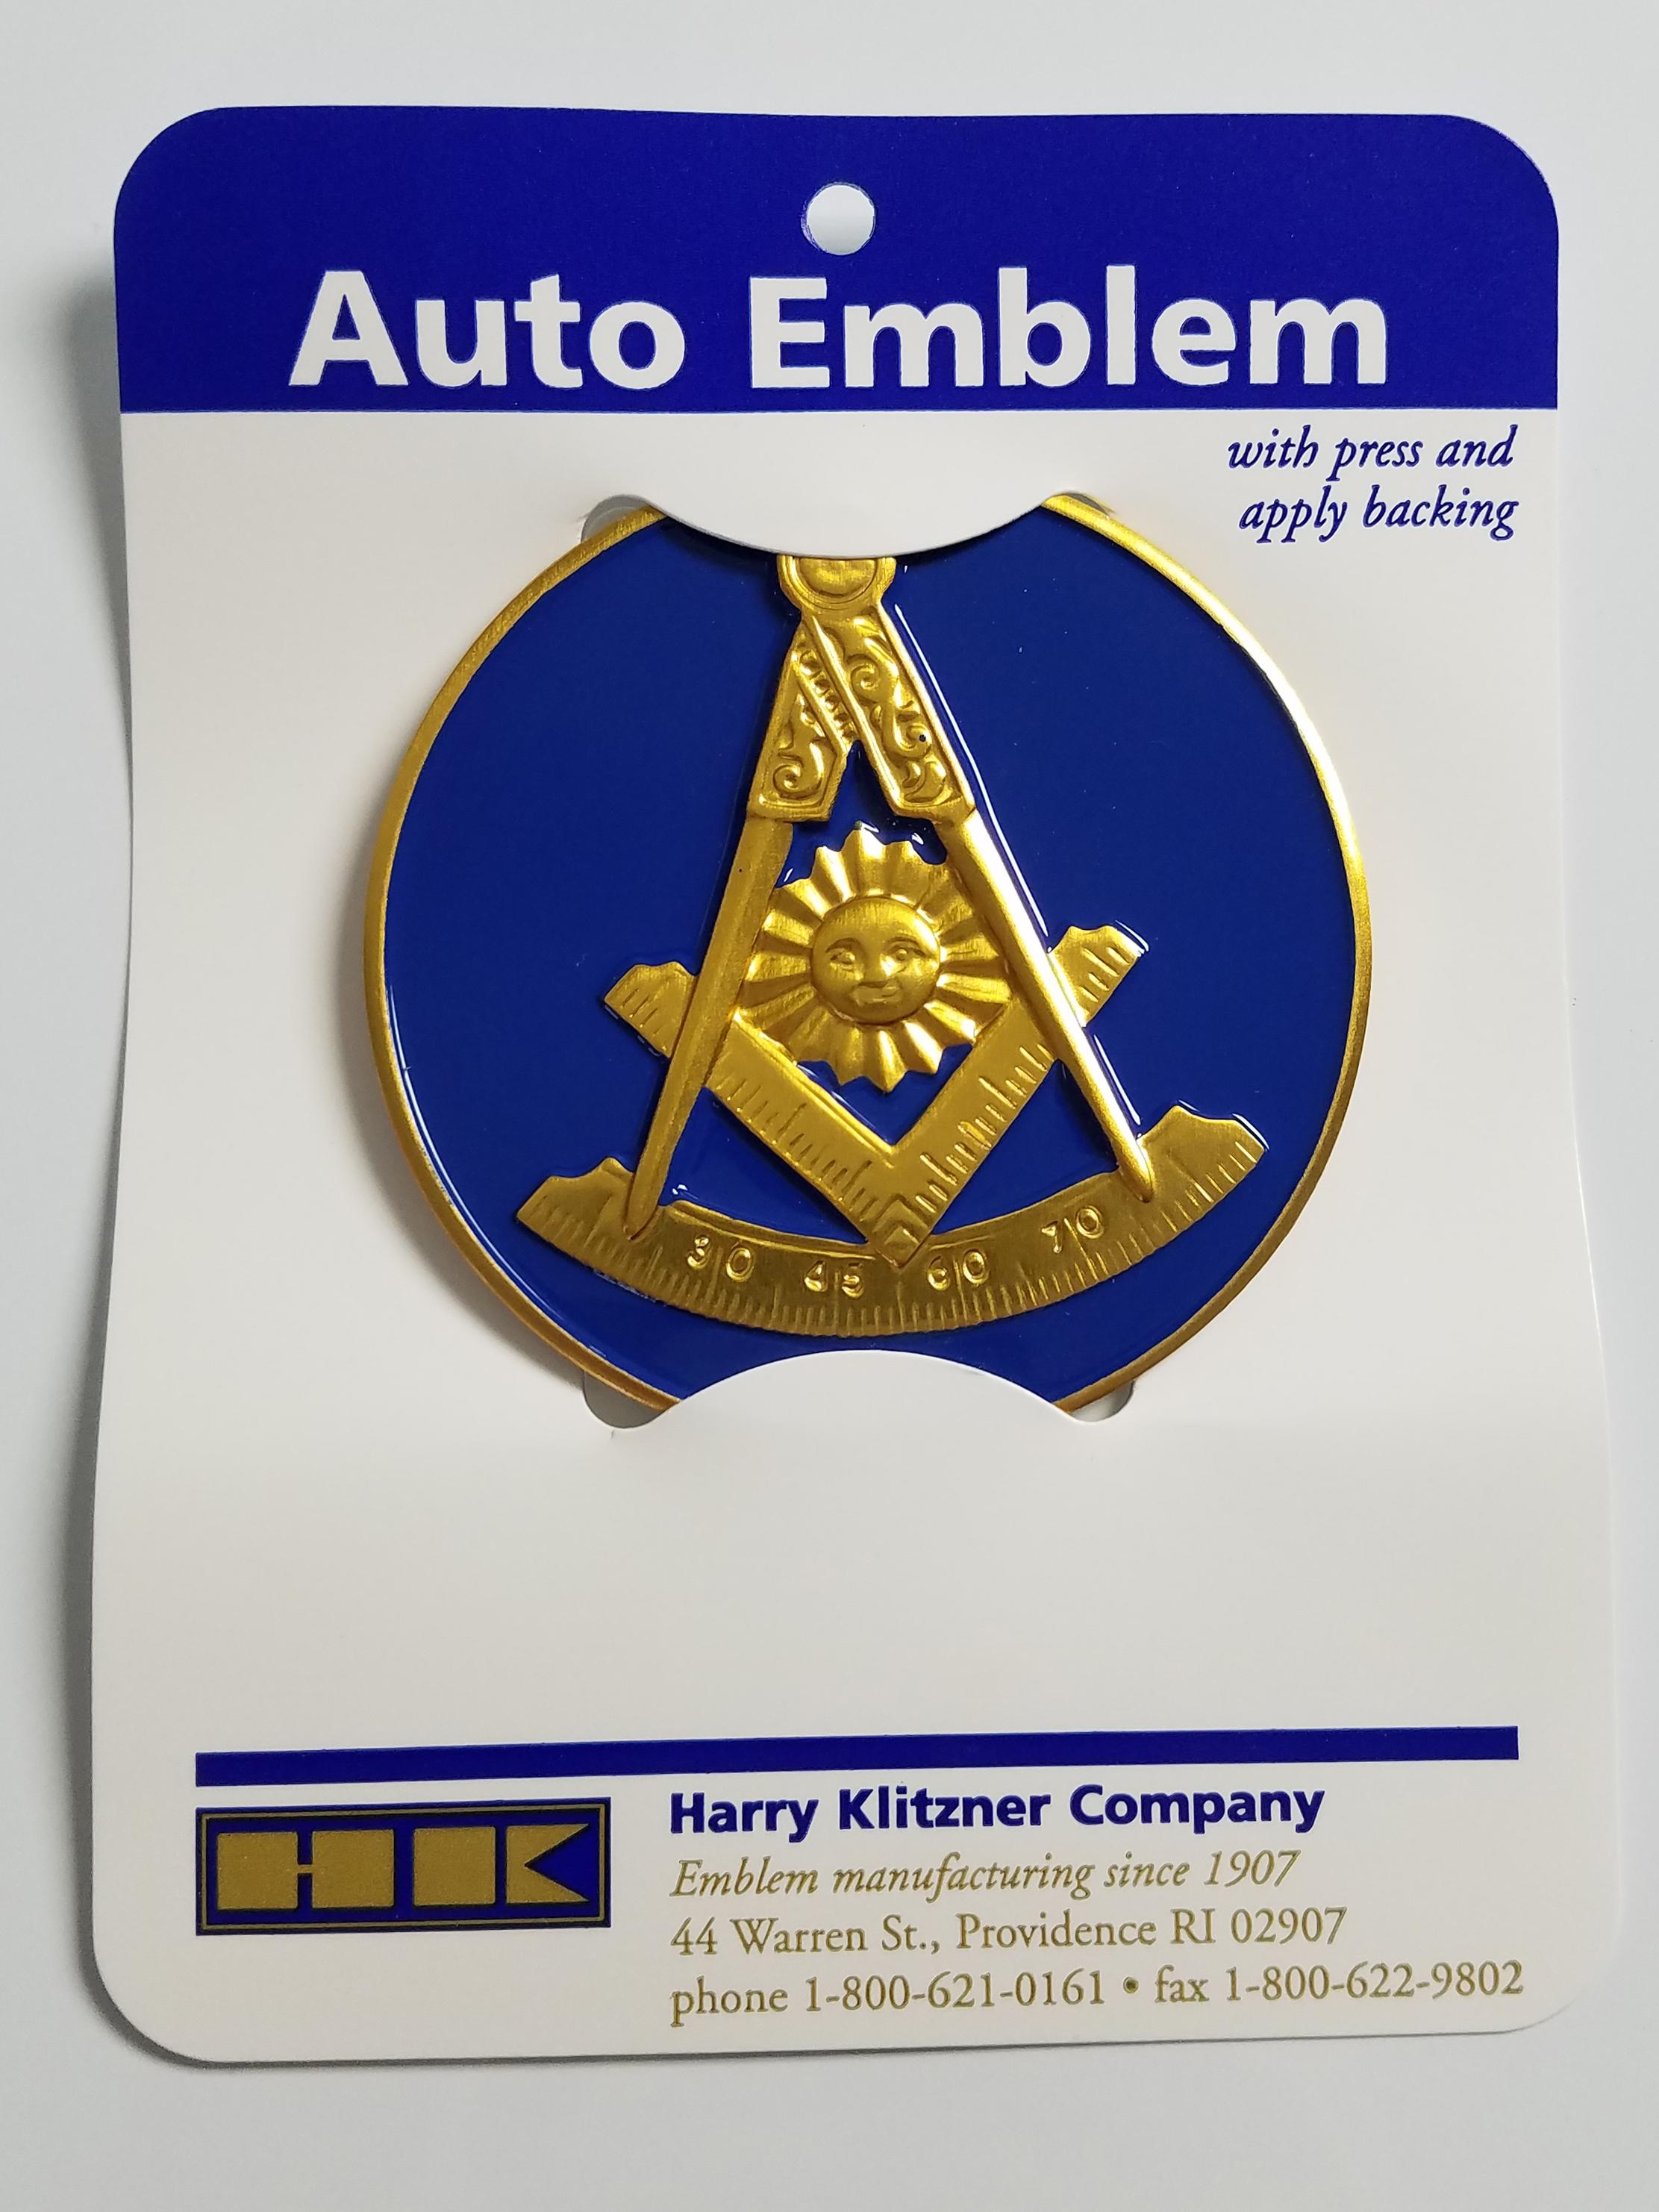 Auto Emblem.jpg